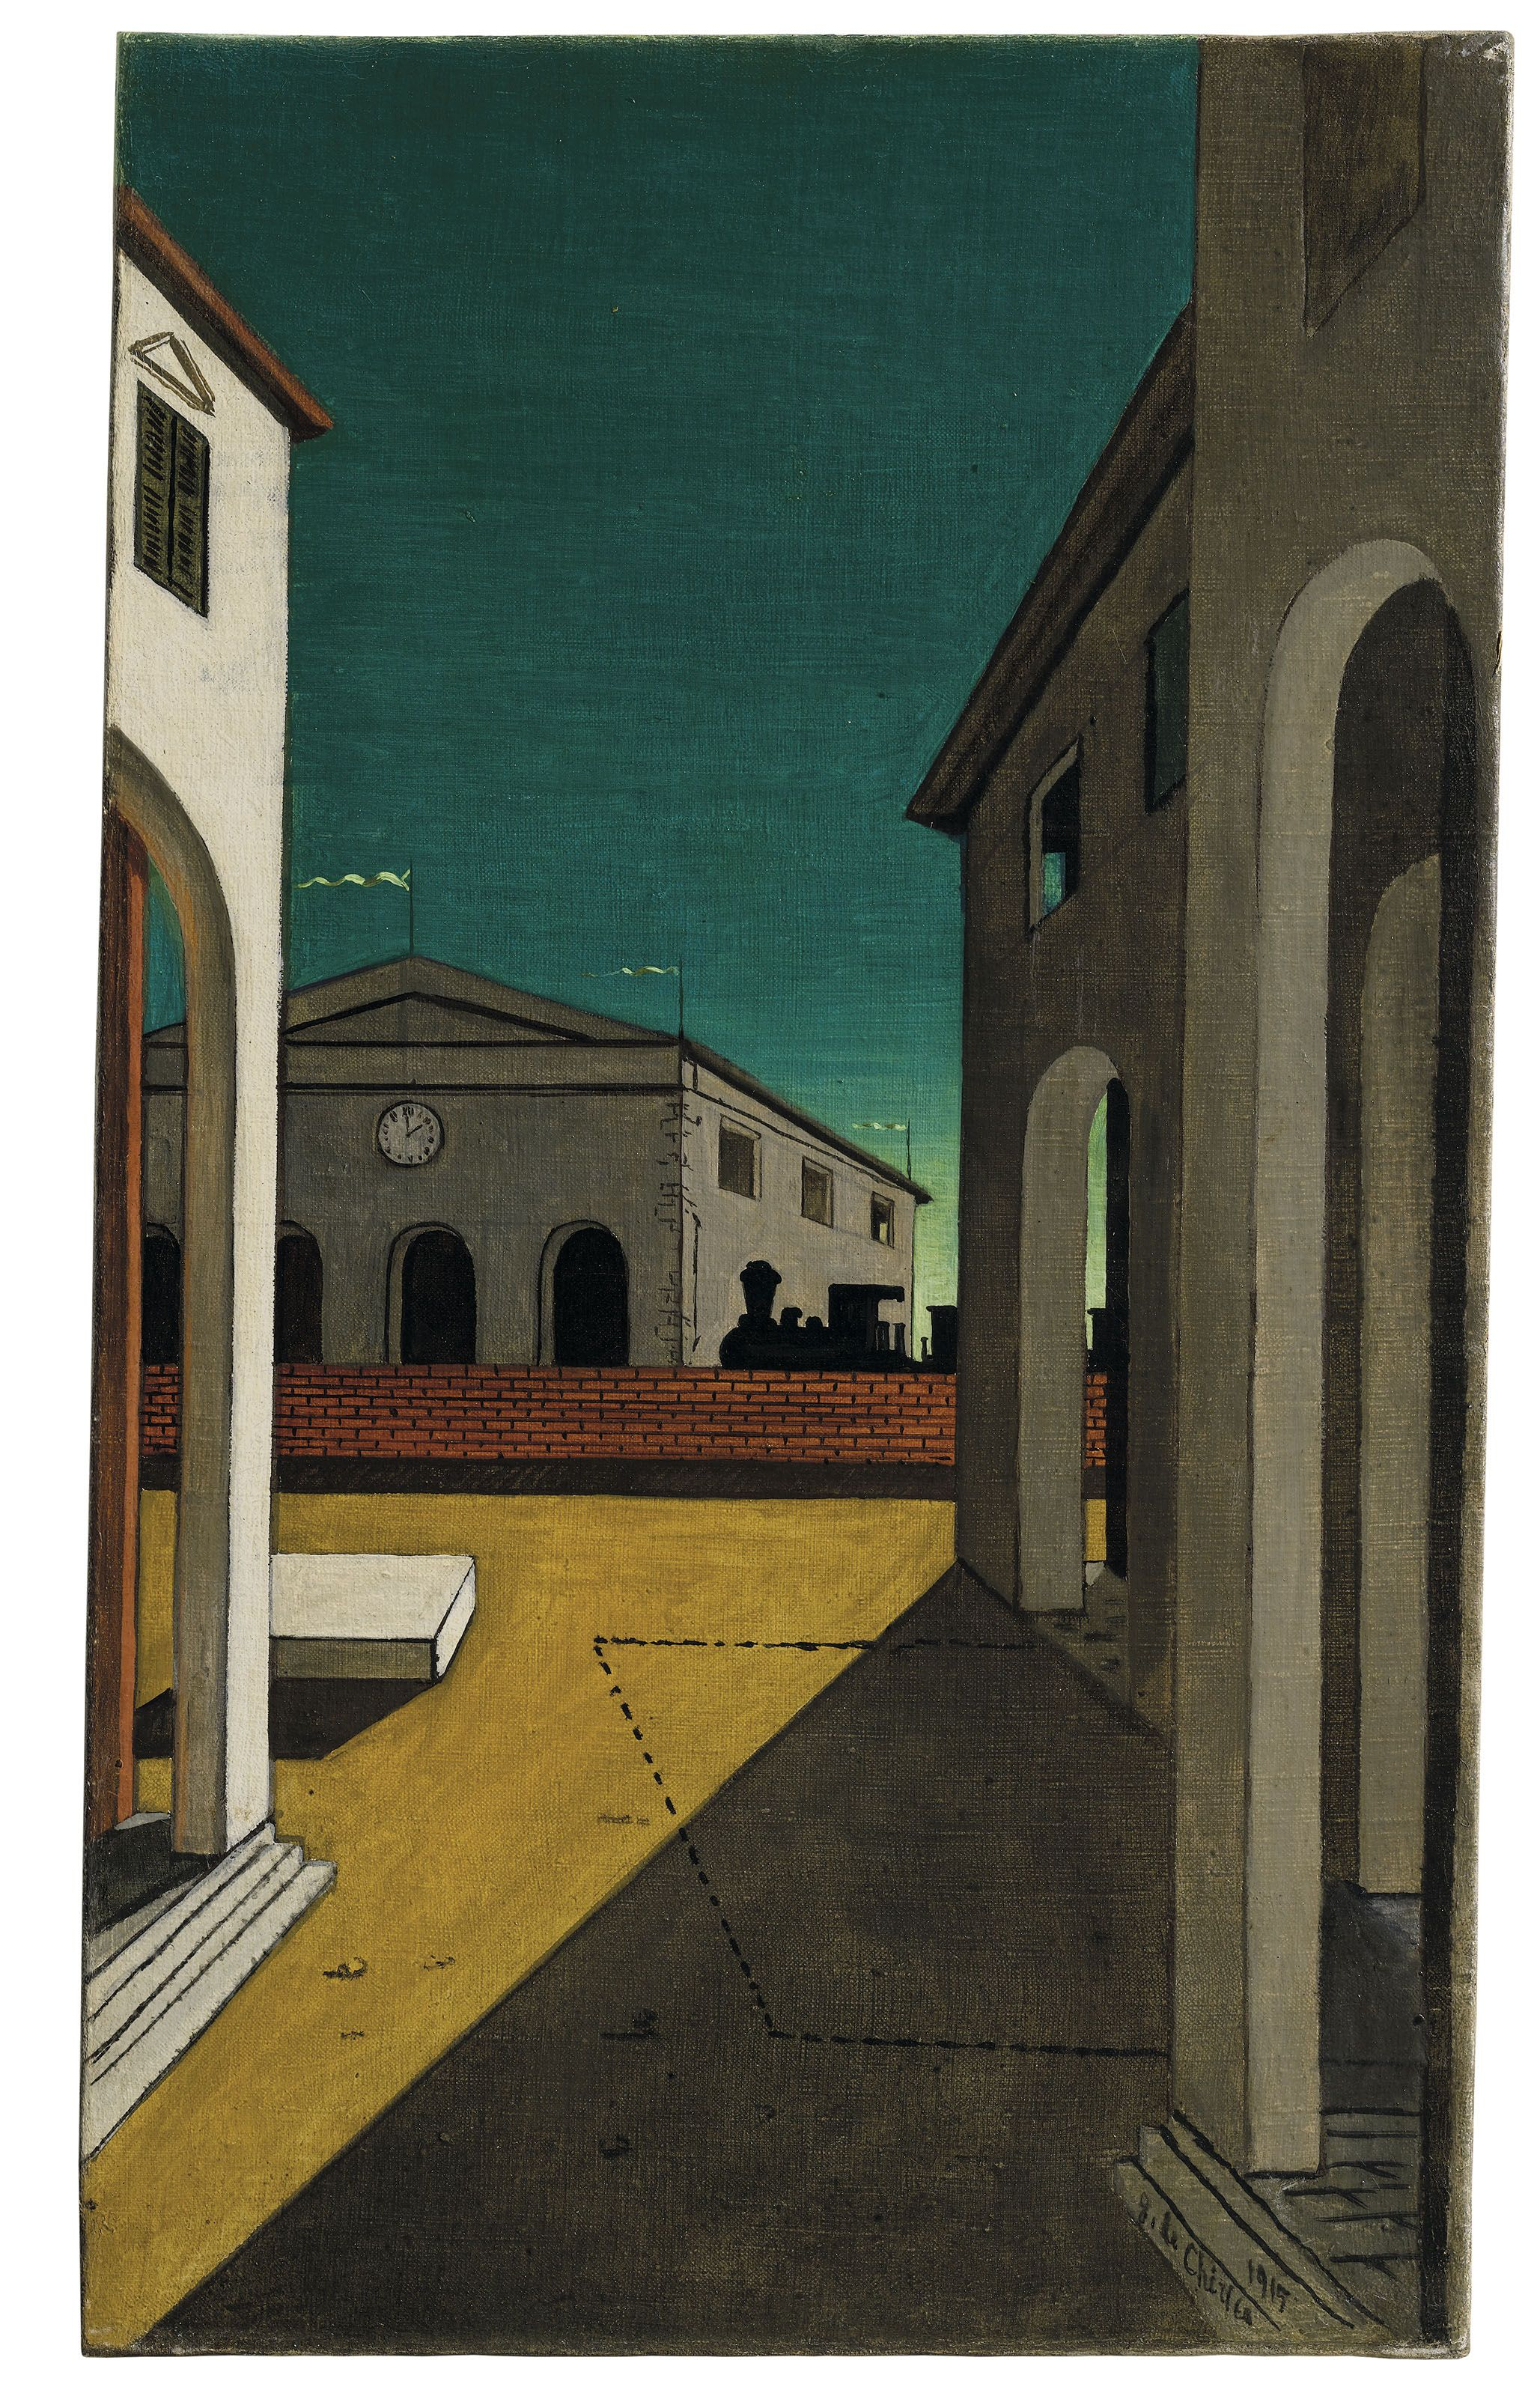 Giorgio de Chirico (1888-1978) Malinconia torinese Estimate GBP 275,000 - GBP 375,000 (USD 350,625 - USD 478,125)